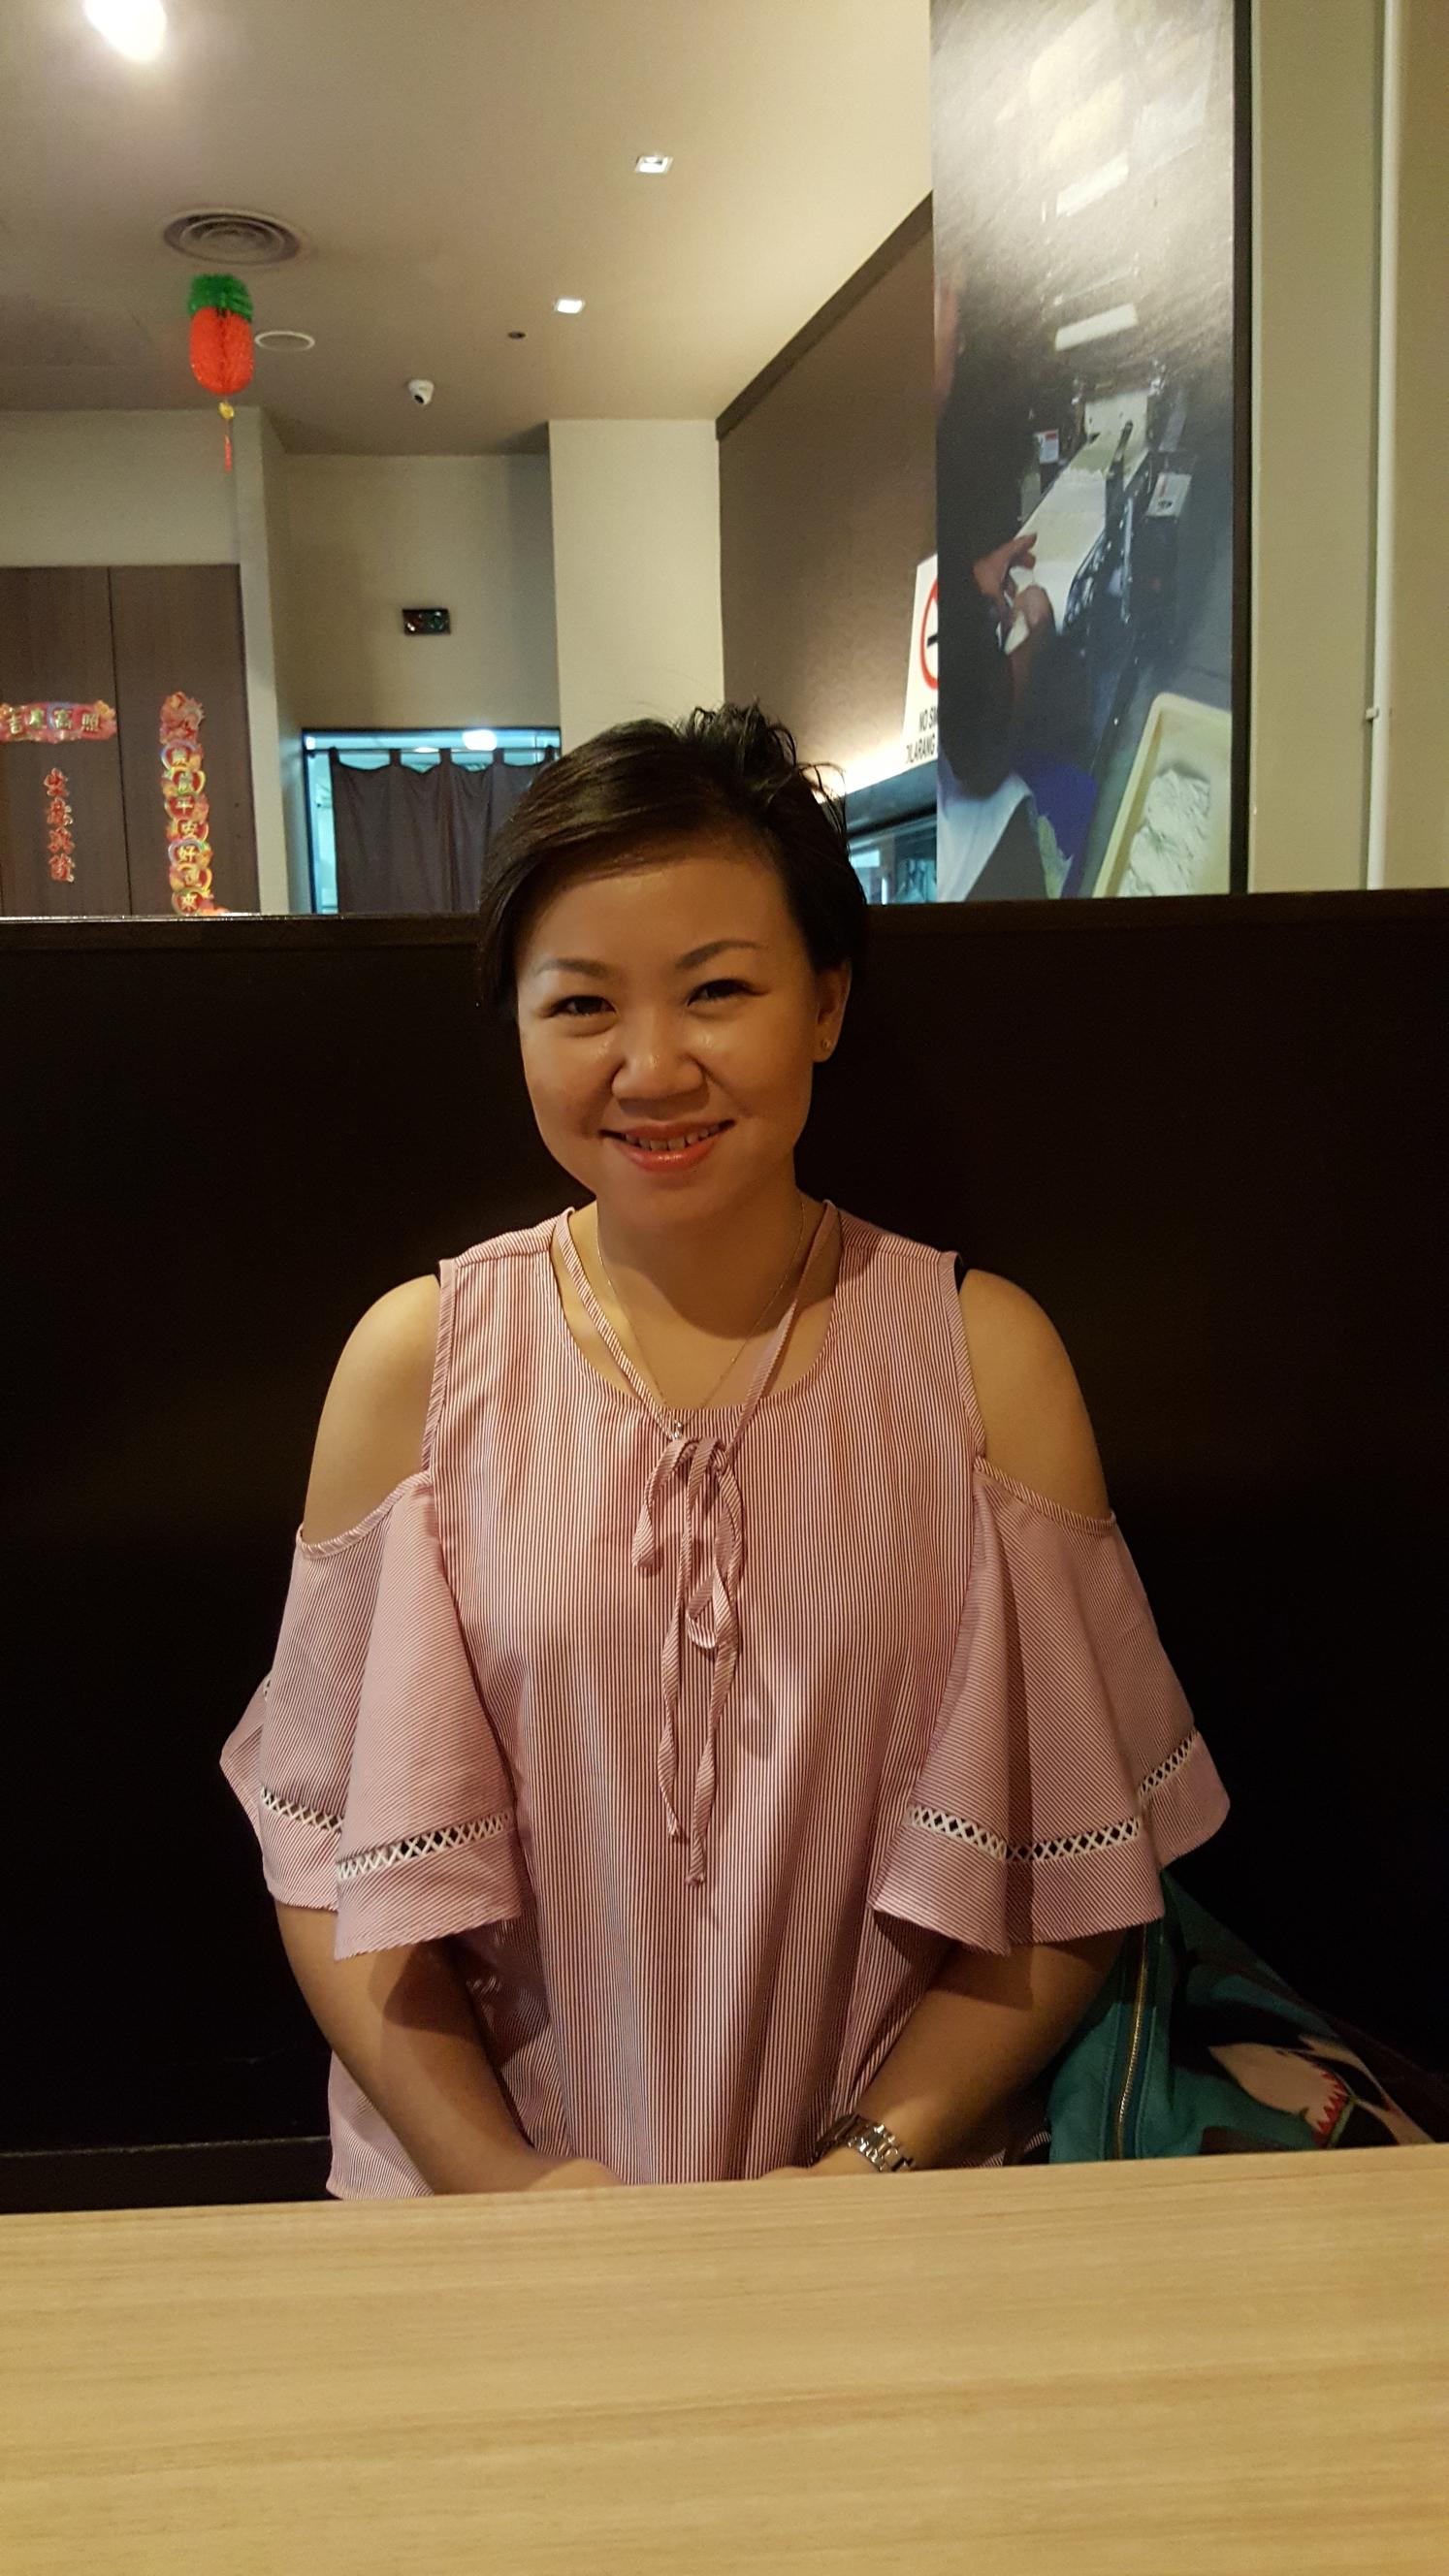 Choy Ling Yap